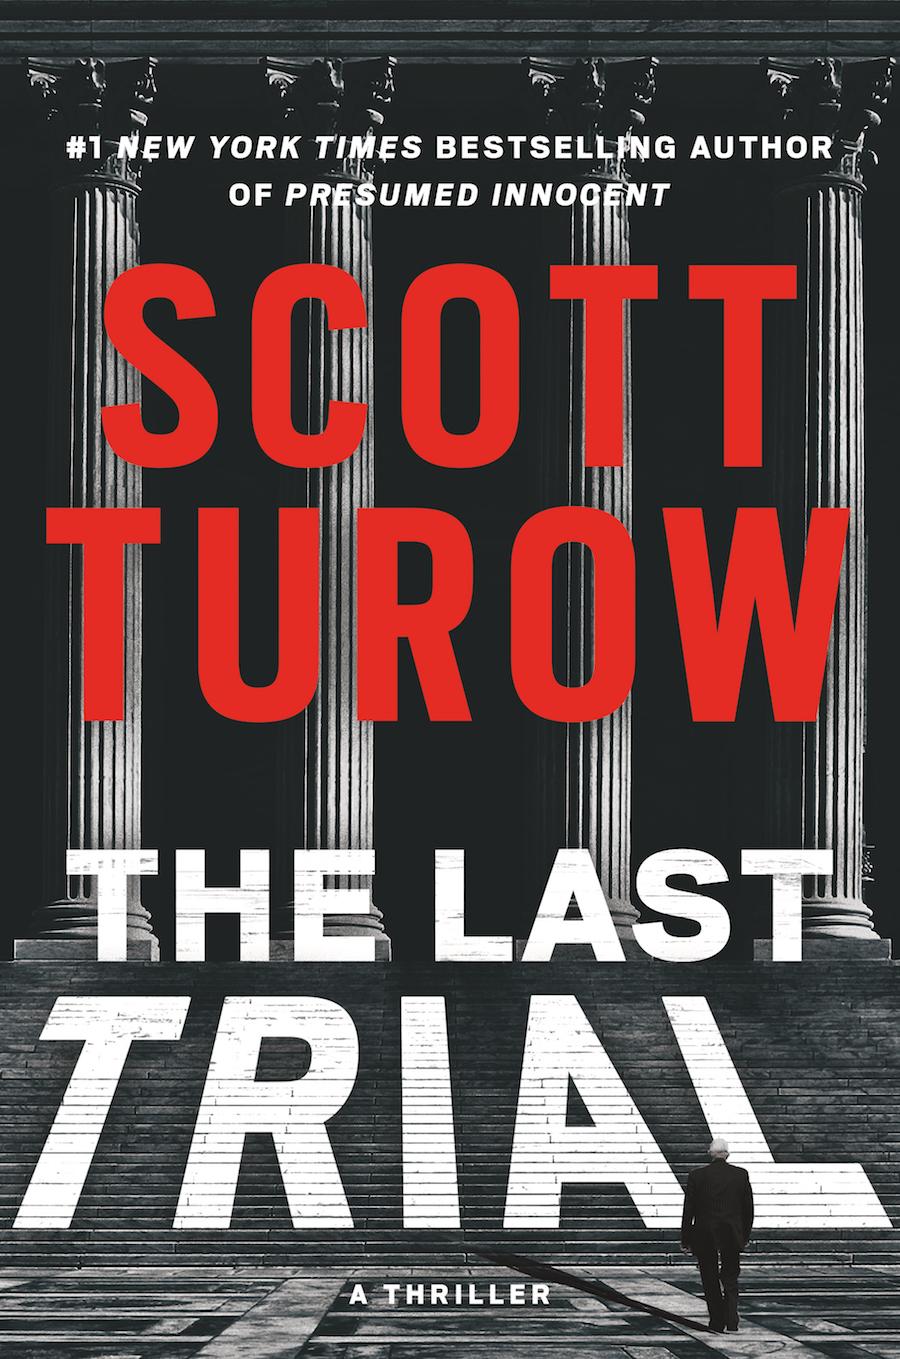 11. THE LAST TRIAL by Scott Turow